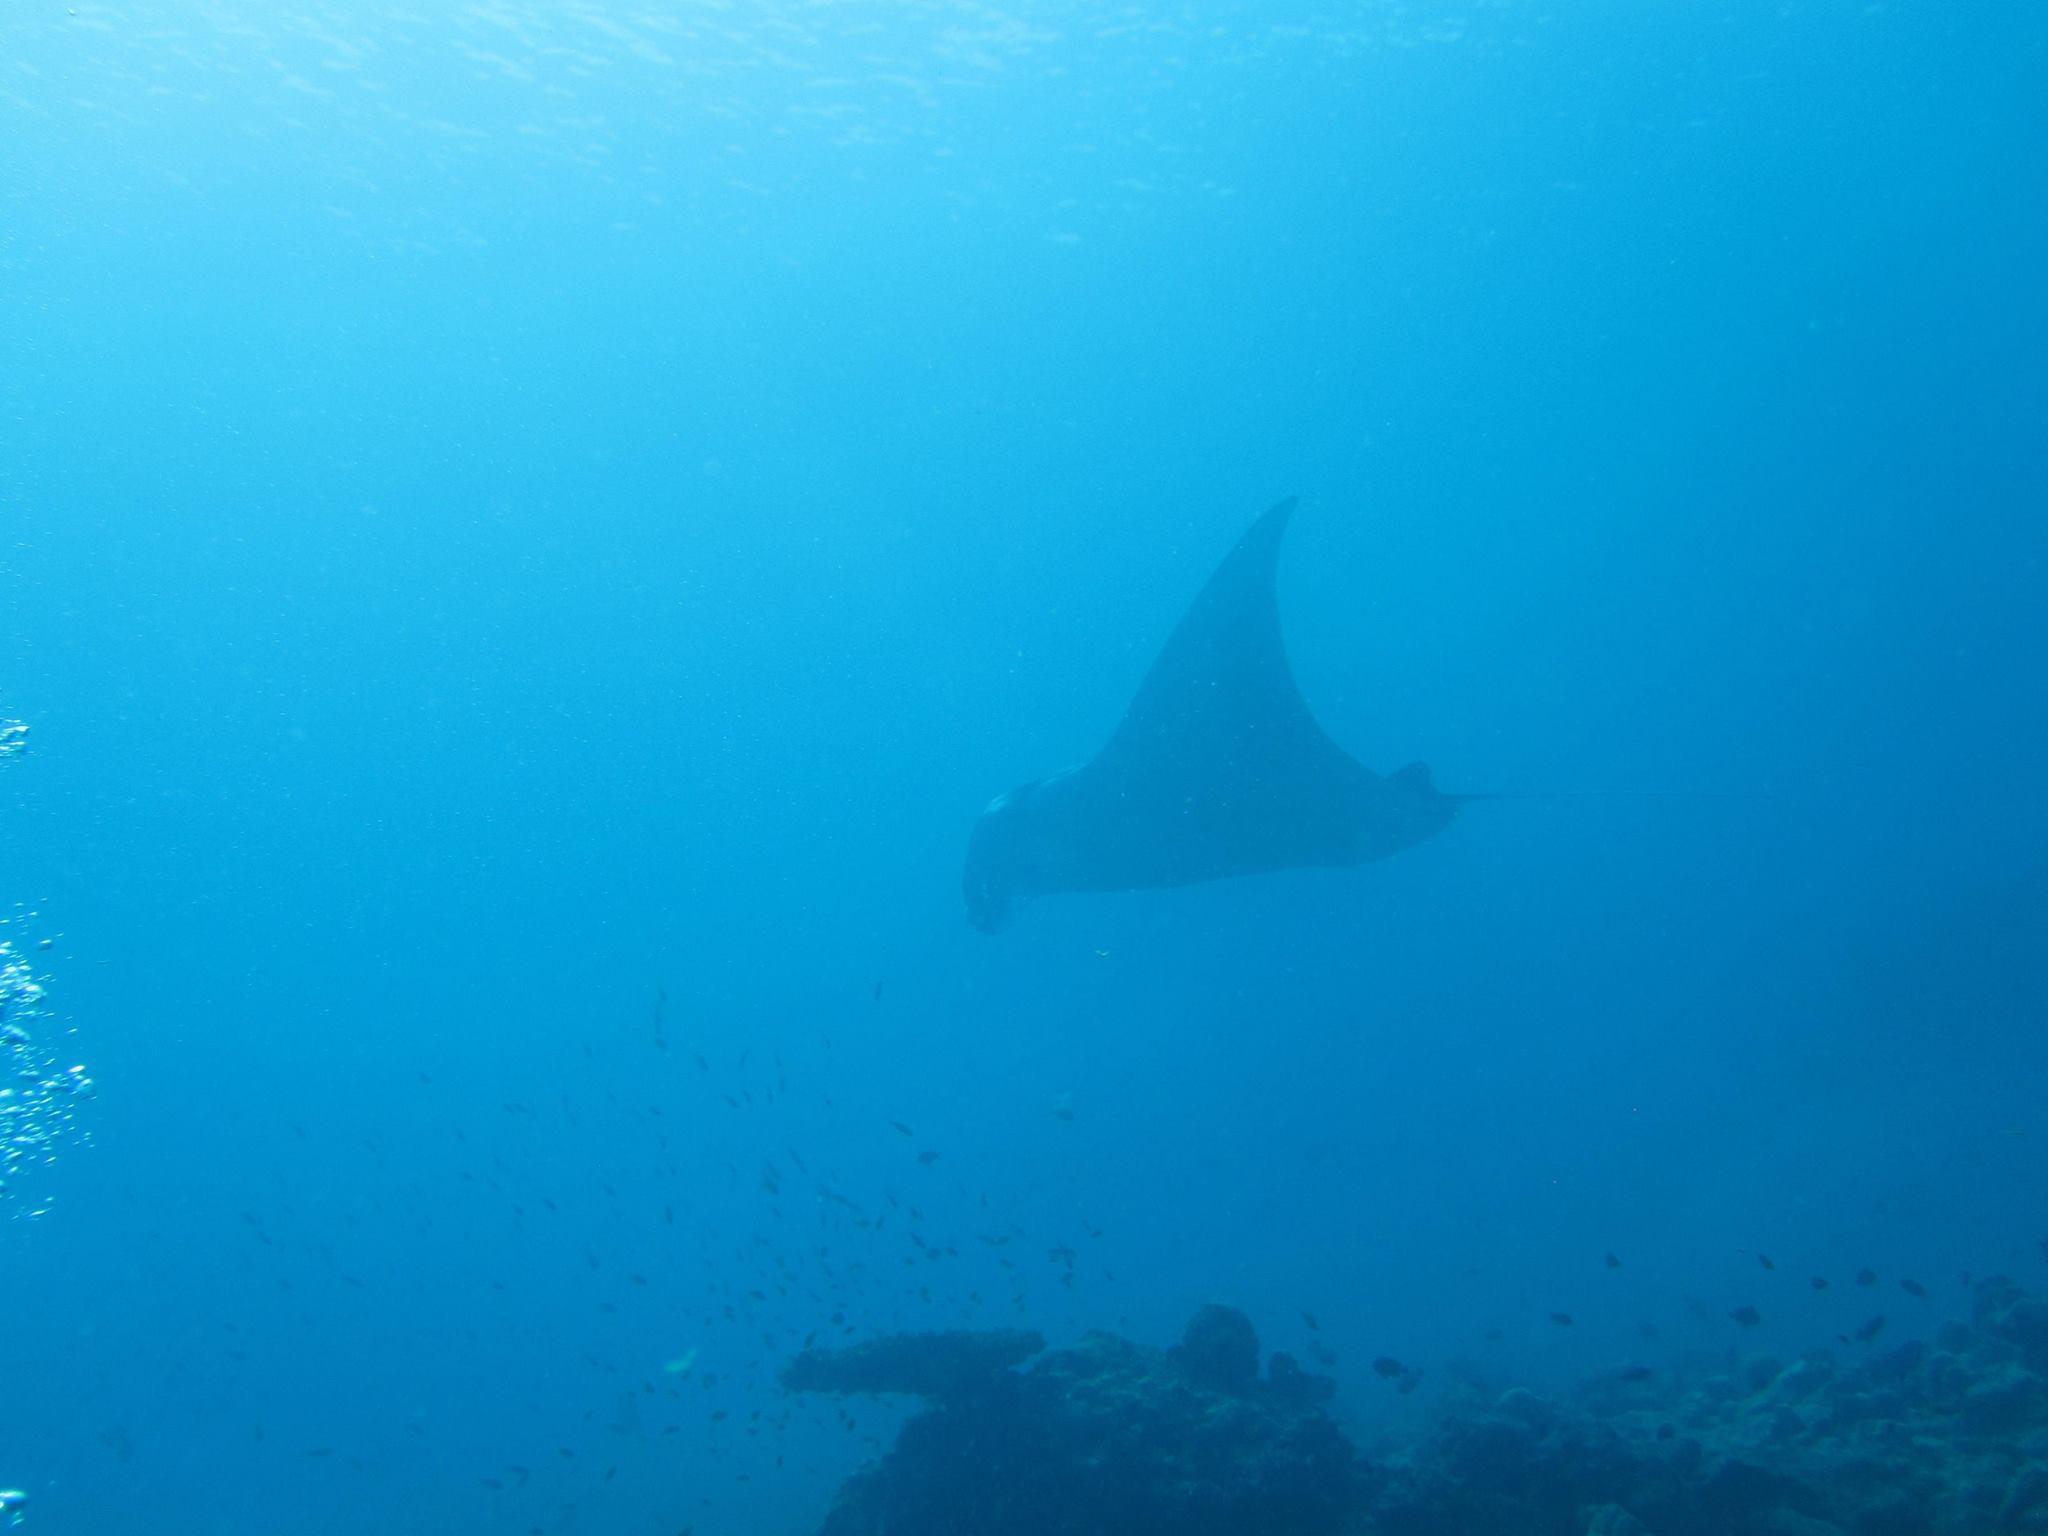 invite-to-paradise-sri-lanka-and-maldives-specialists-travel-agent-tour-operator-customer-review--feedback-joel-rhian-atmopshere-kanifushi-manta-ray.jpg